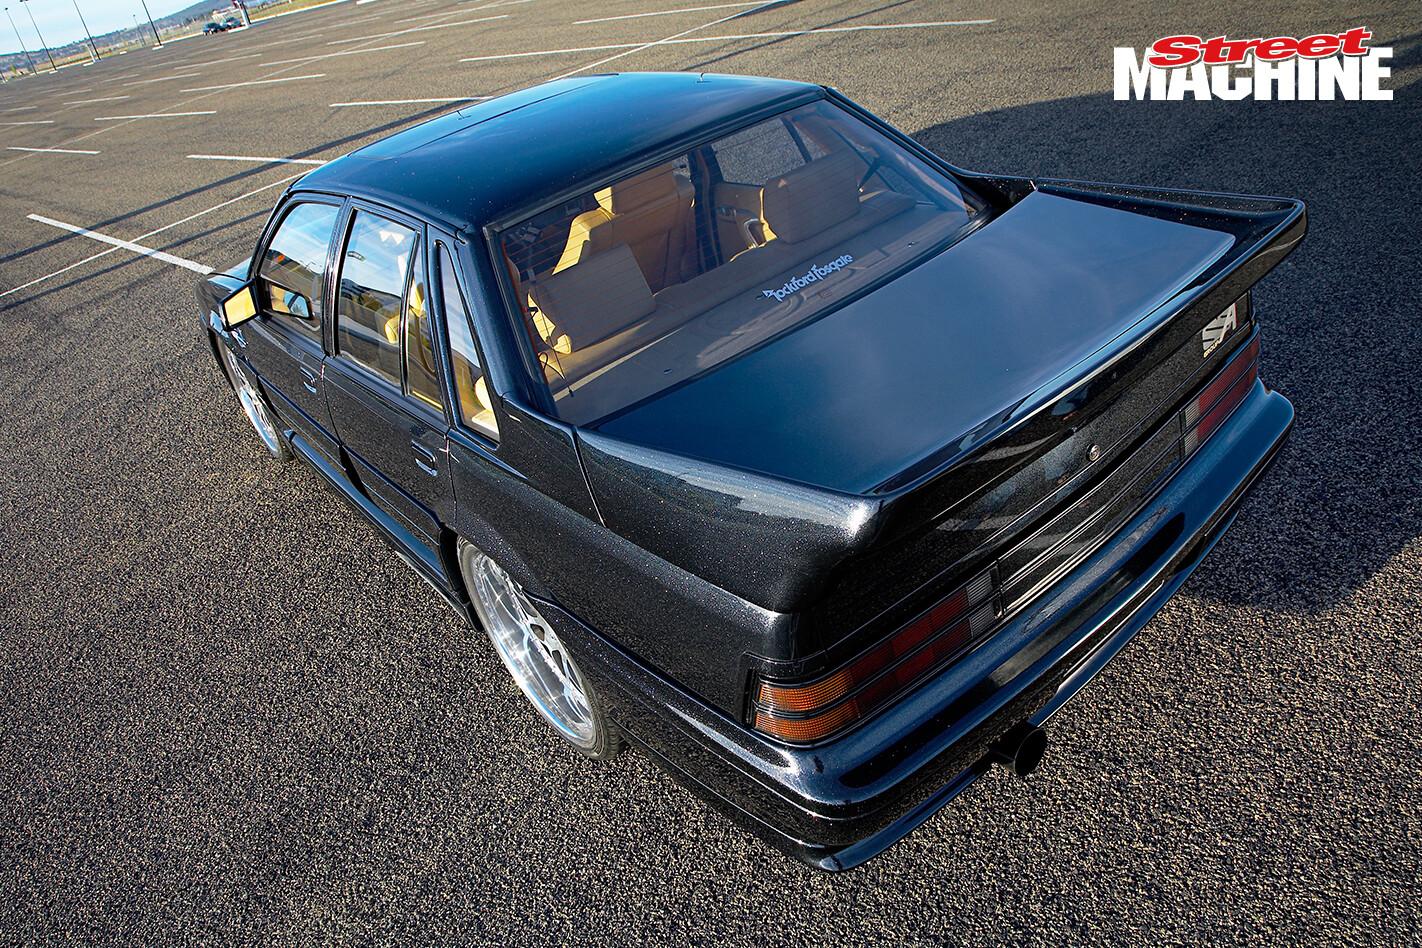 VL Walkinshaw Twin Turbo 1 Nw Jpg